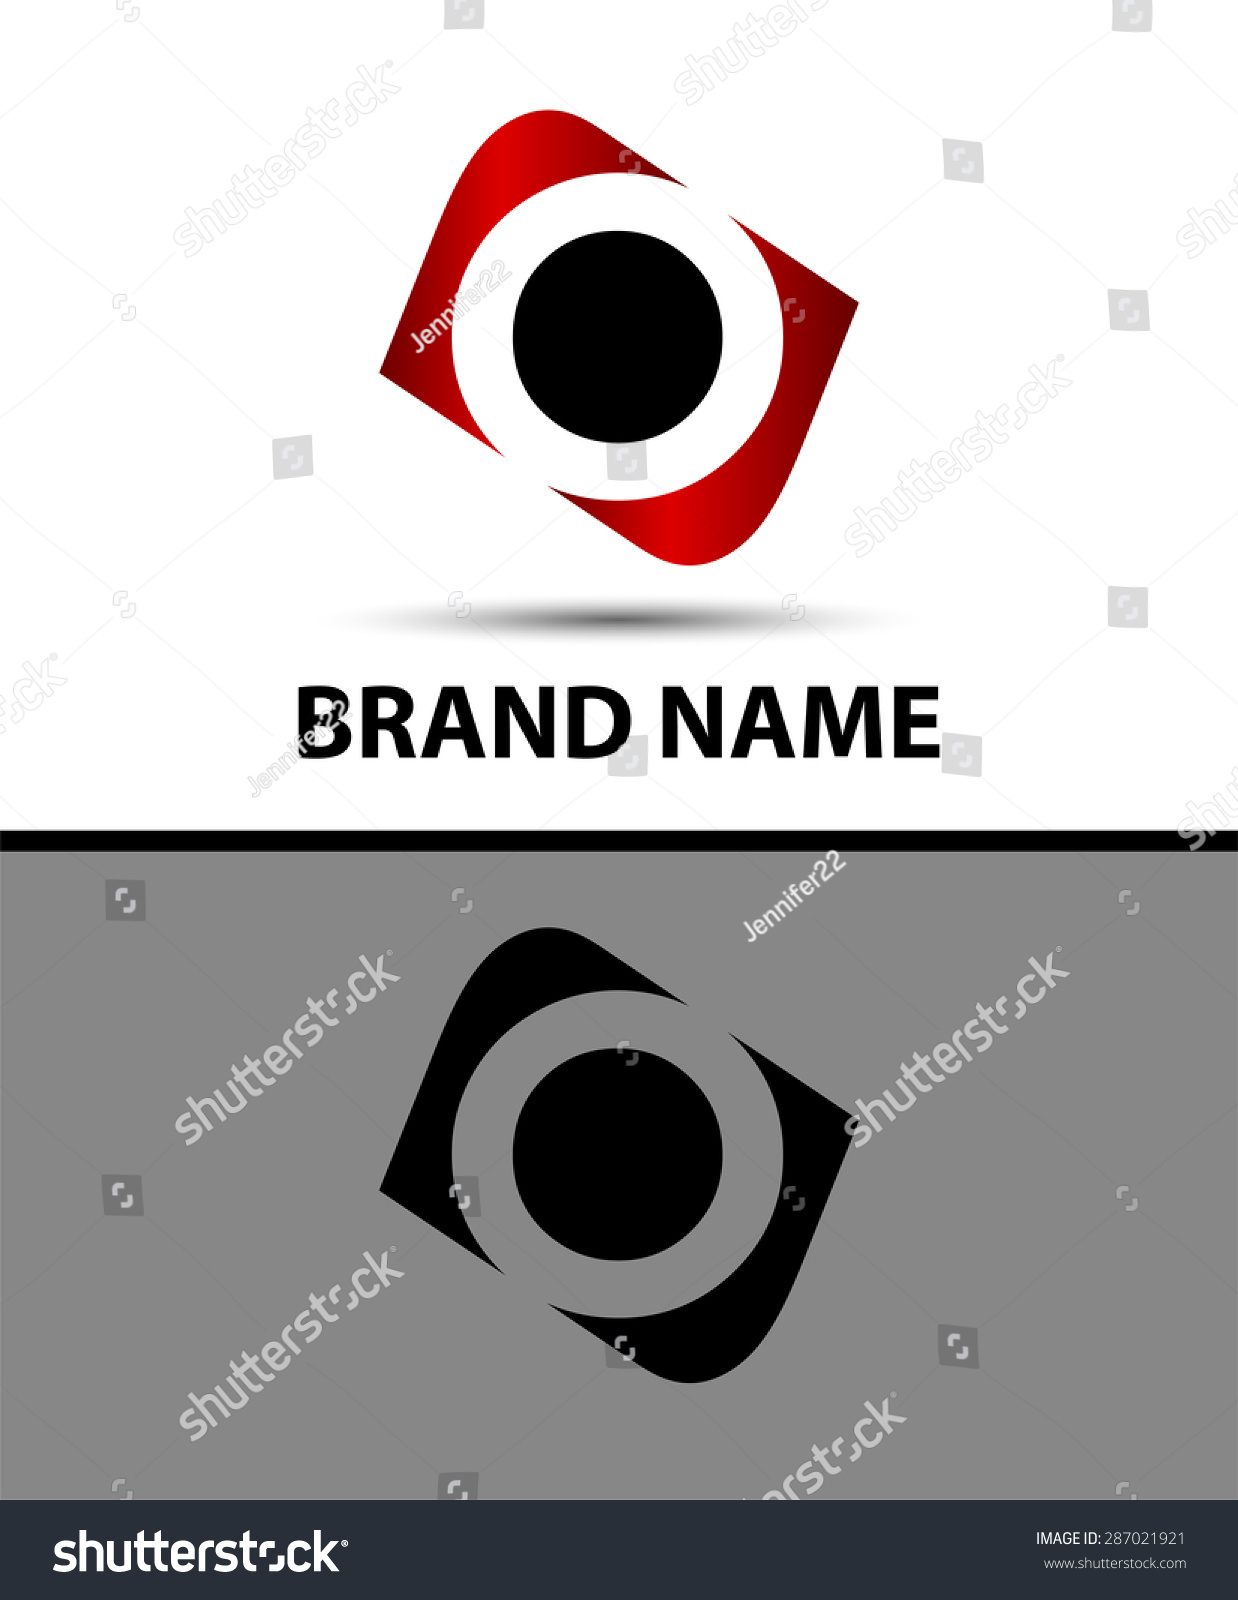 Ov kosher symbol images symbol and sign ideas stock symbol o gallery symbol and sign ideas letter o vector elegant alphabet symbol stock vector biocorpaavc